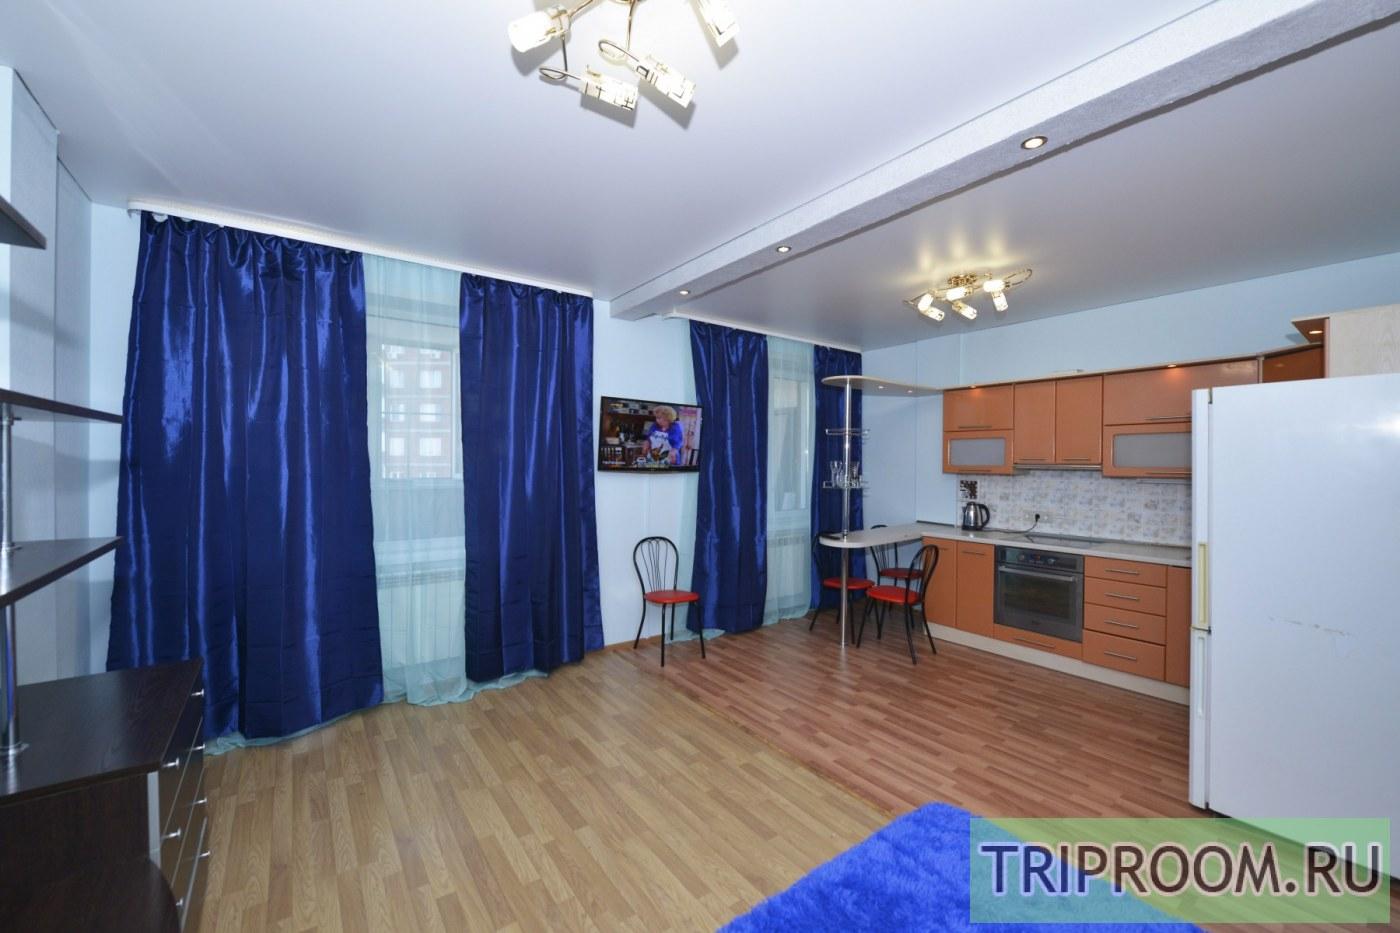 1-комнатная квартира посуточно (вариант № 40607), ул. Галущака улица, фото № 12